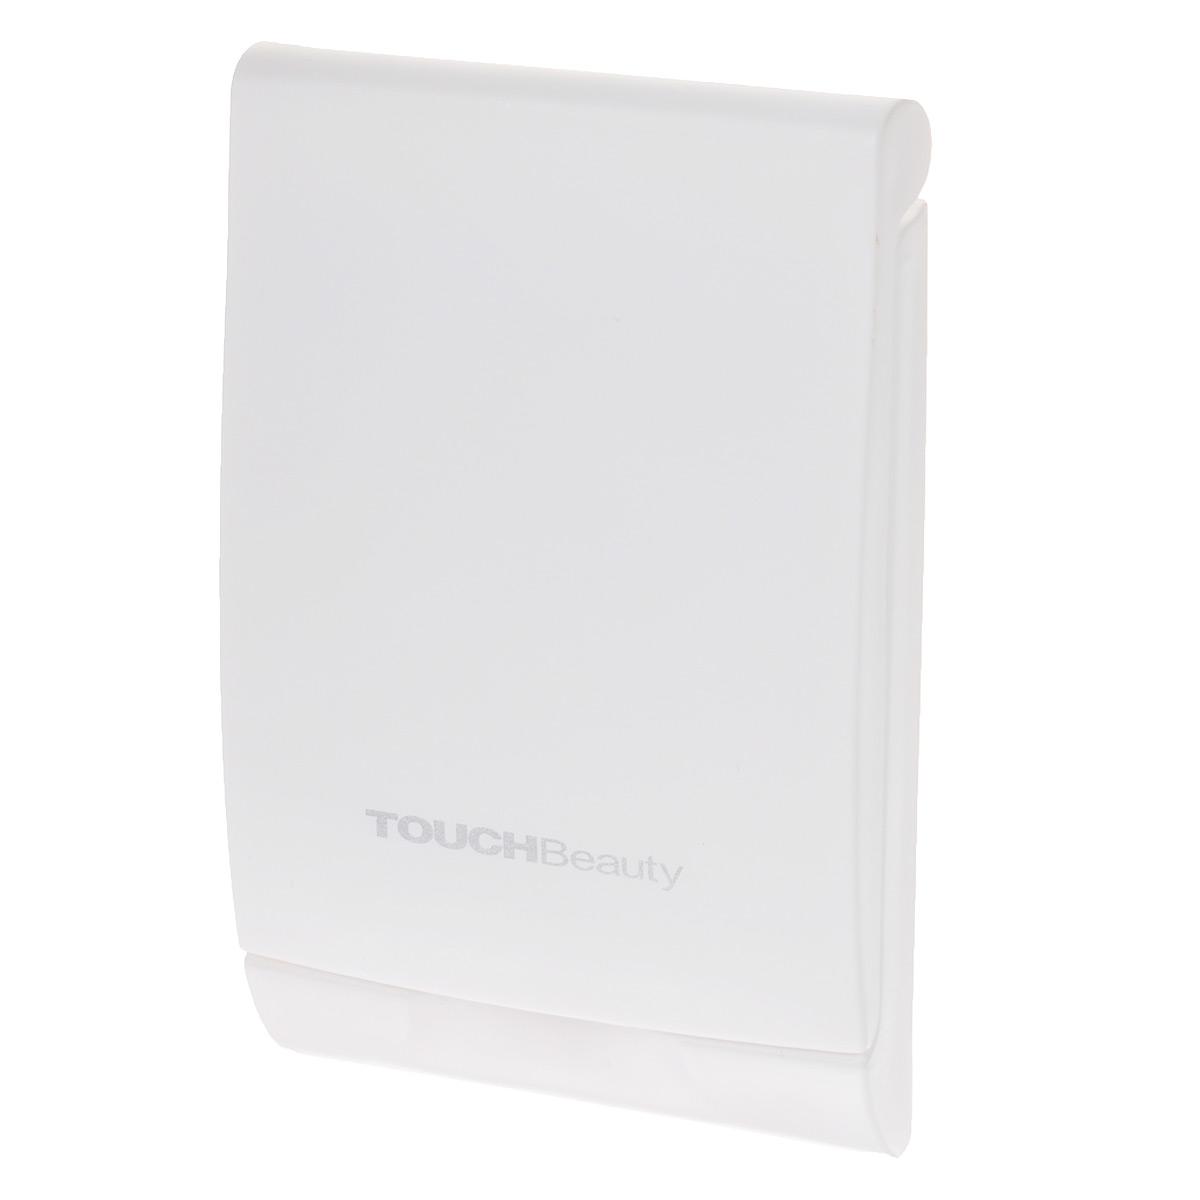 Touchbeauty Компактное двойное зеркало, с подсветкой. AS-0508